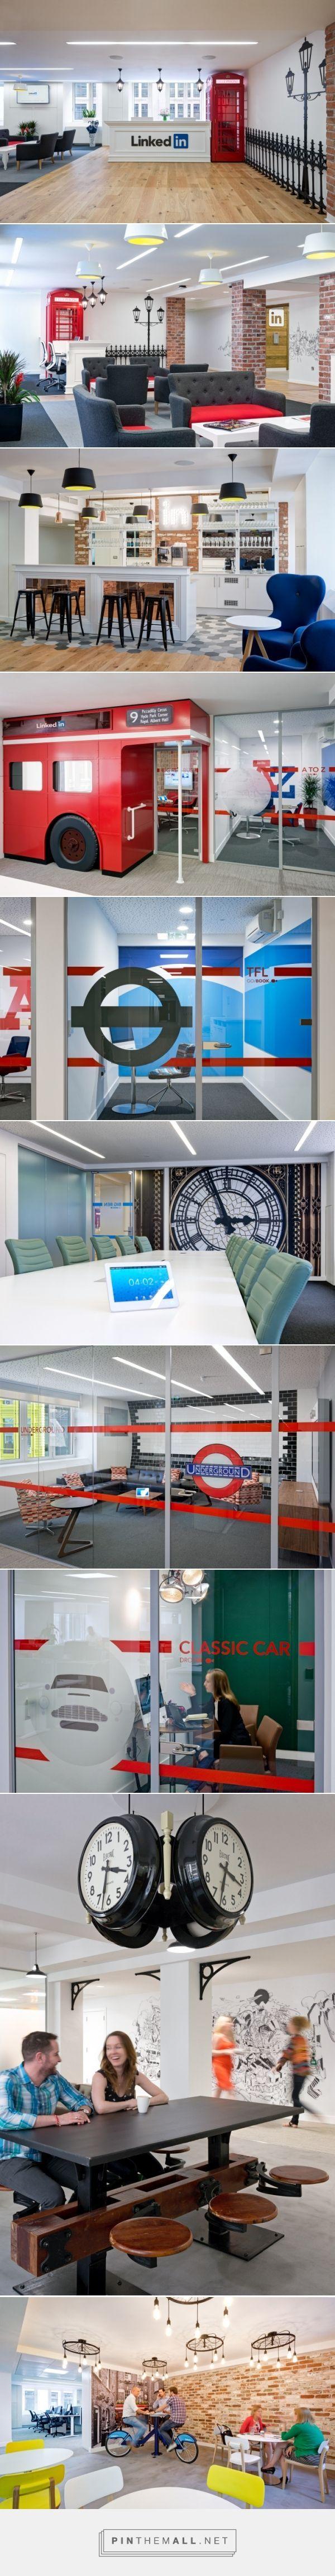 LinkedIn Office by Denton Associates, London – UK » Retail Design Blog http://retaildesignblog.net/2015/08/18/linkedin-office-by-denton-associate... - a grouped images picture - Pin Them All